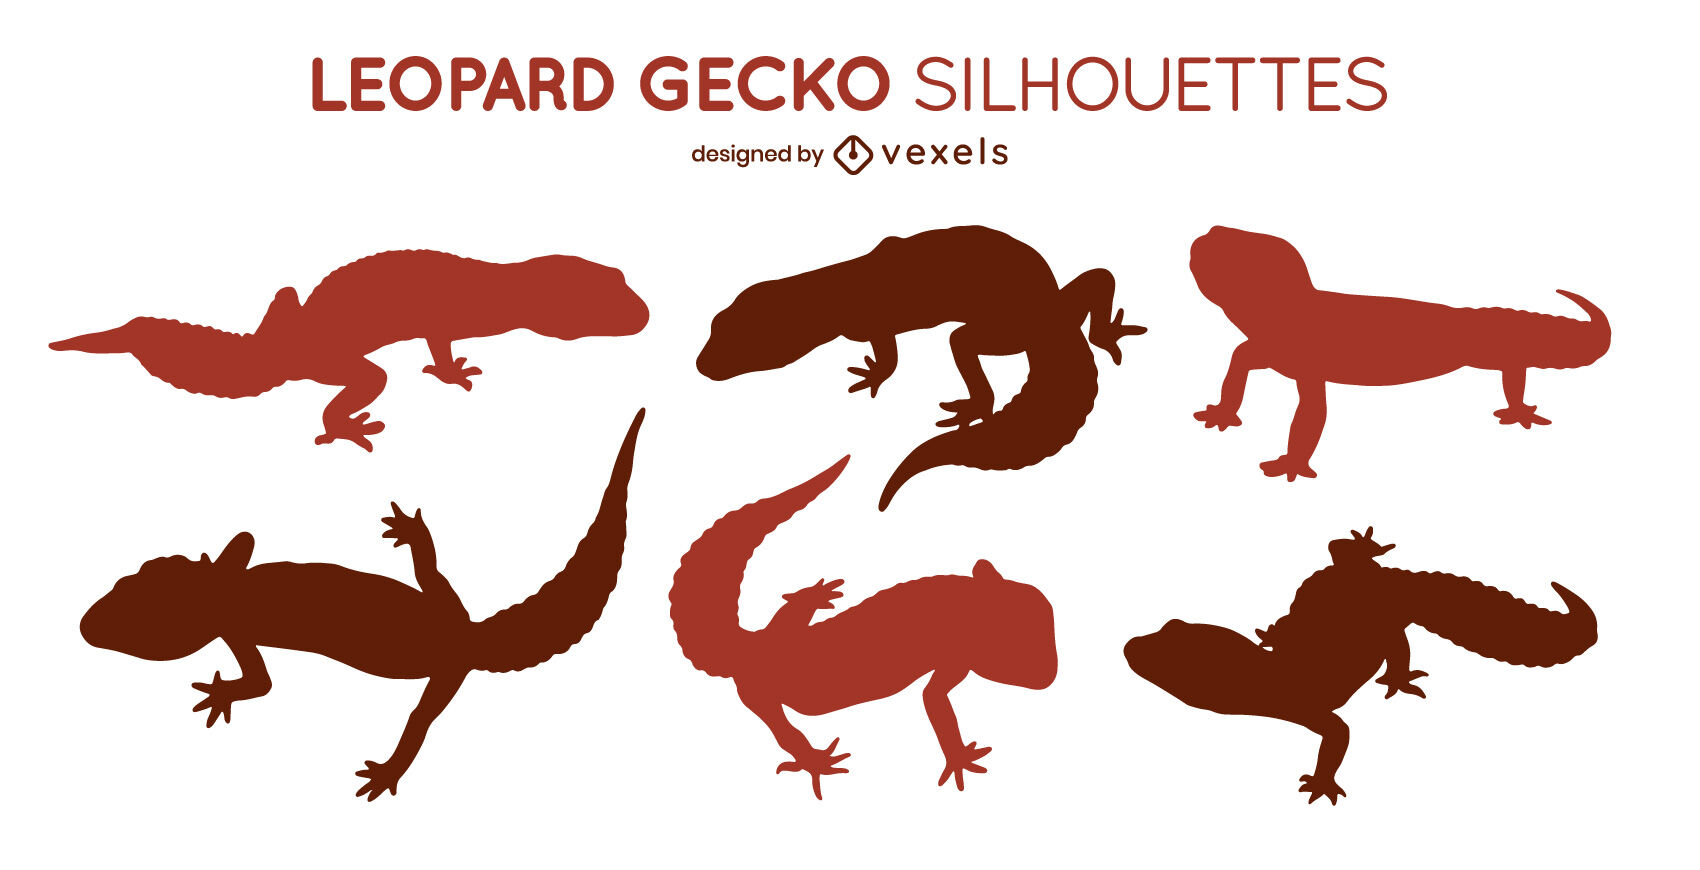 Conjunto de siluetas de geckos leopardo